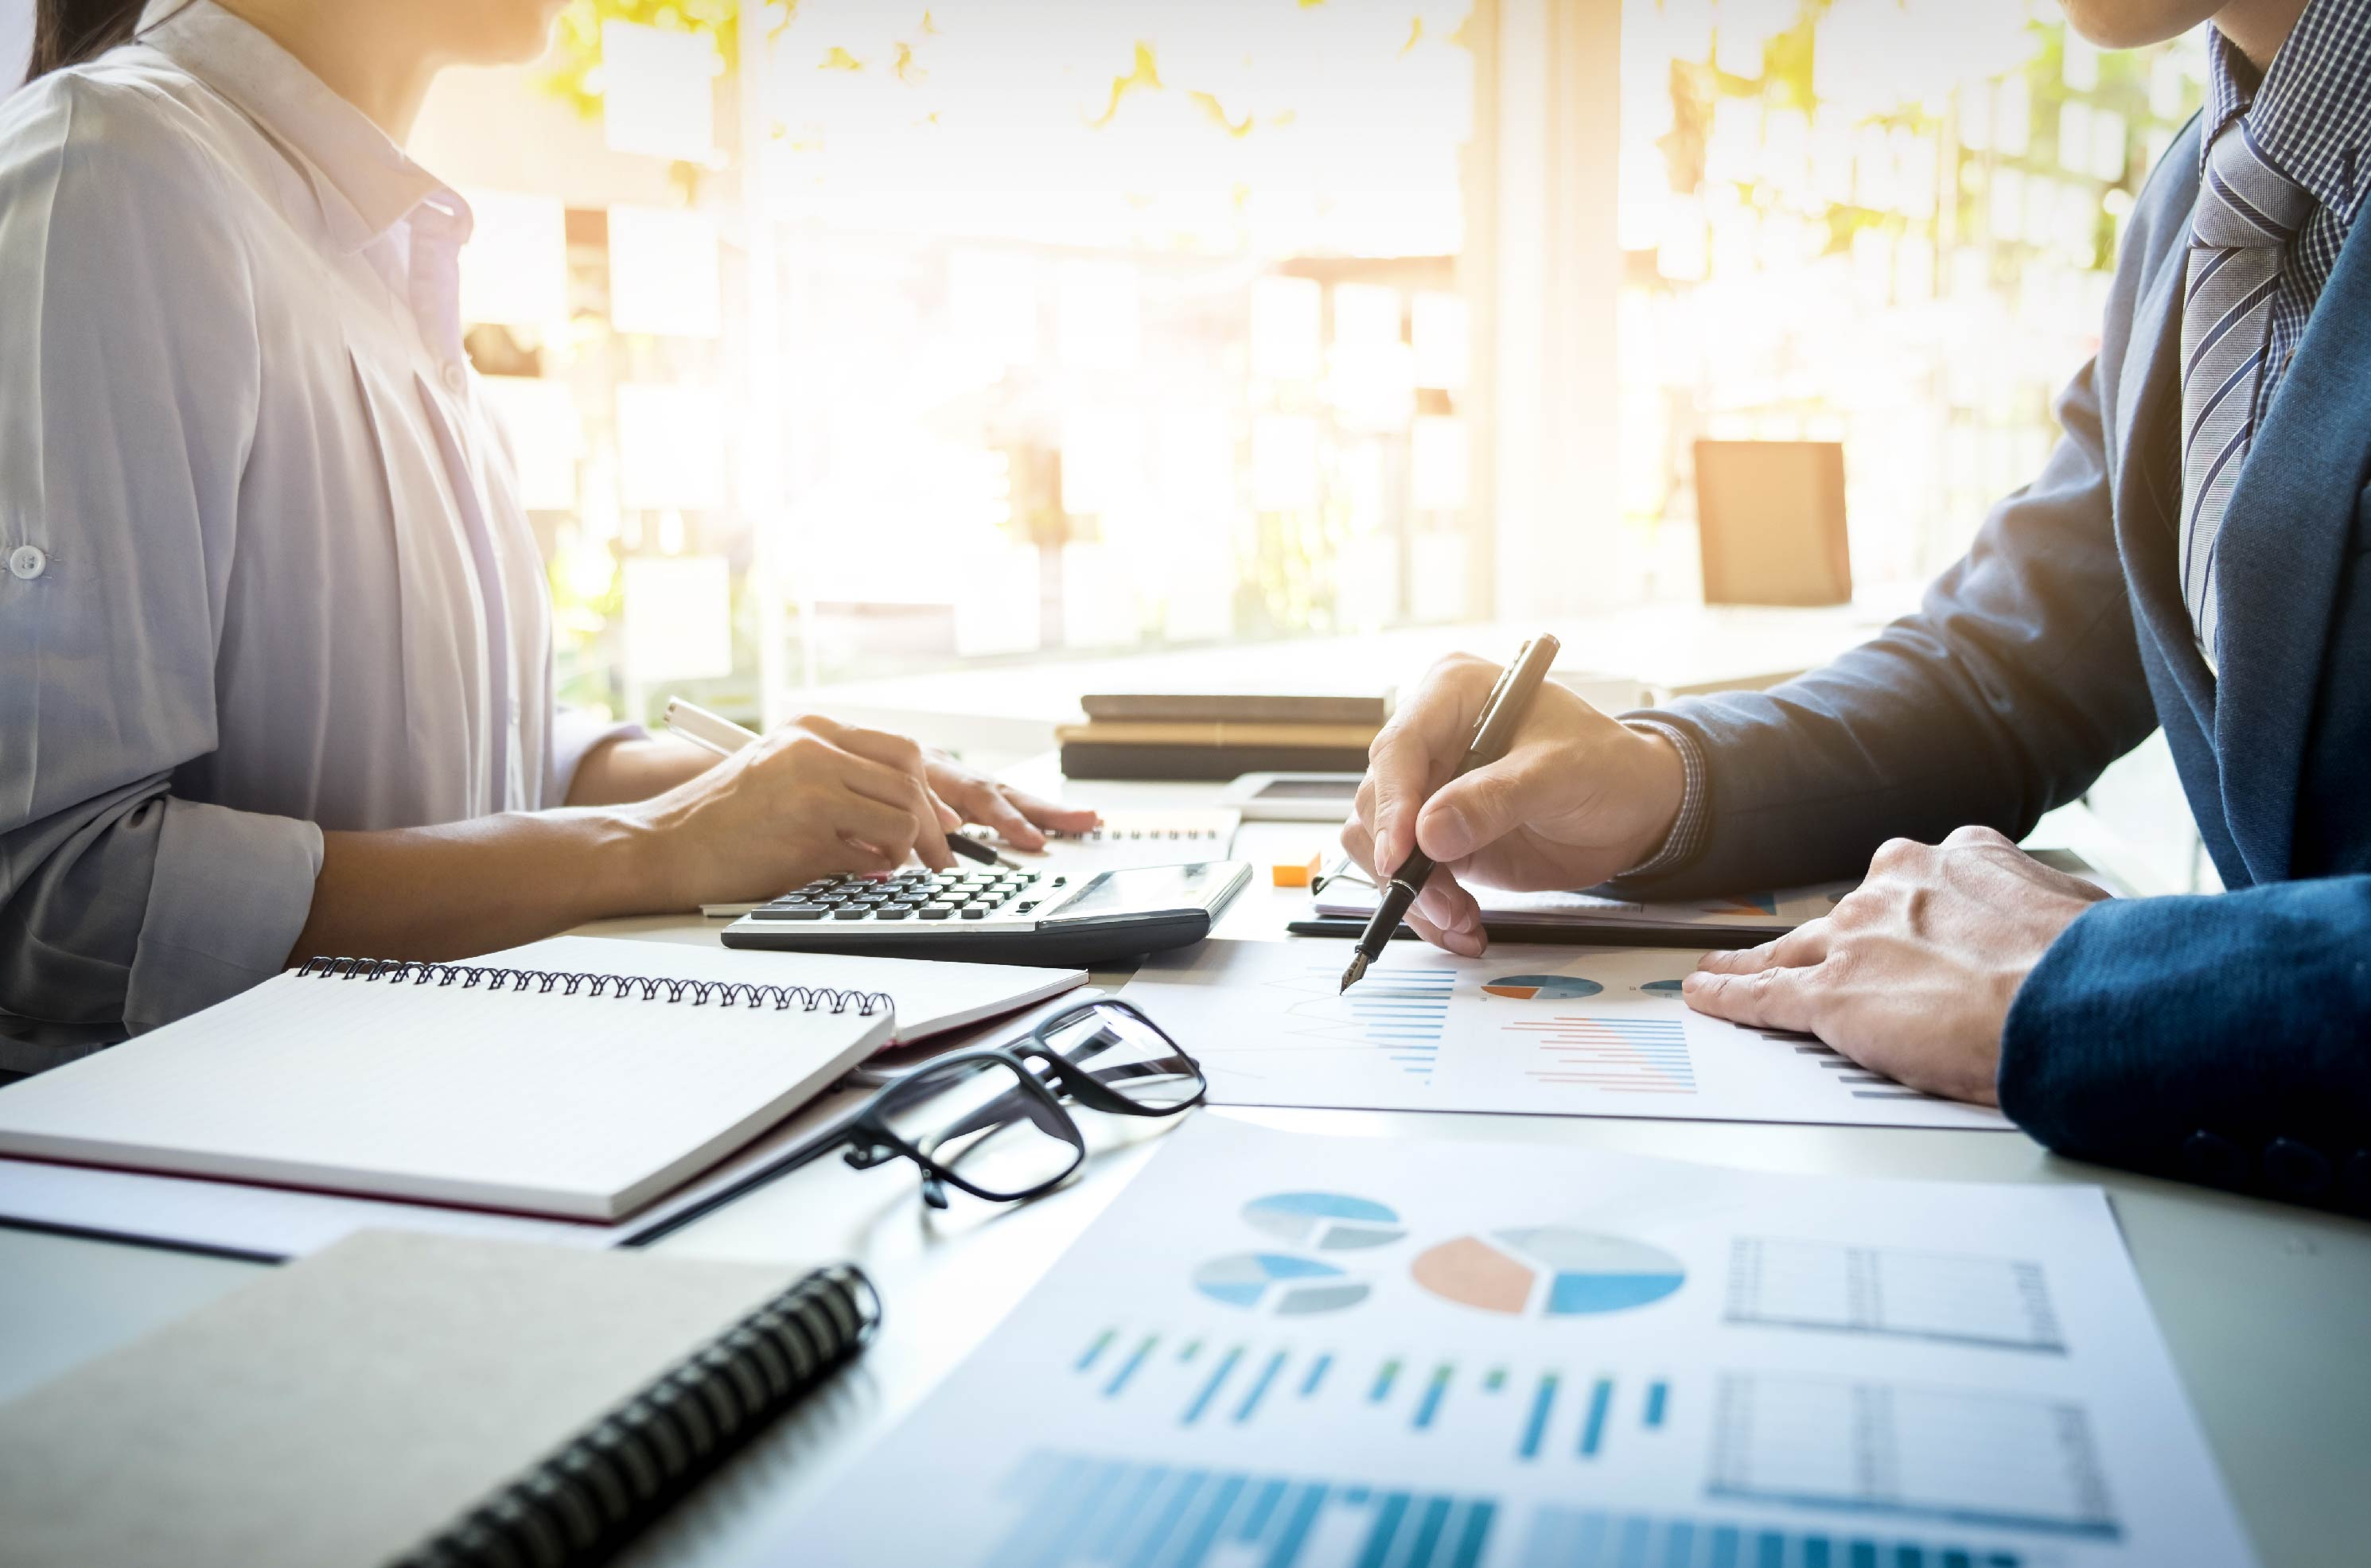 Tips Bisnis Praktis Bangun Bisnis AUTO-PILOT dari Business